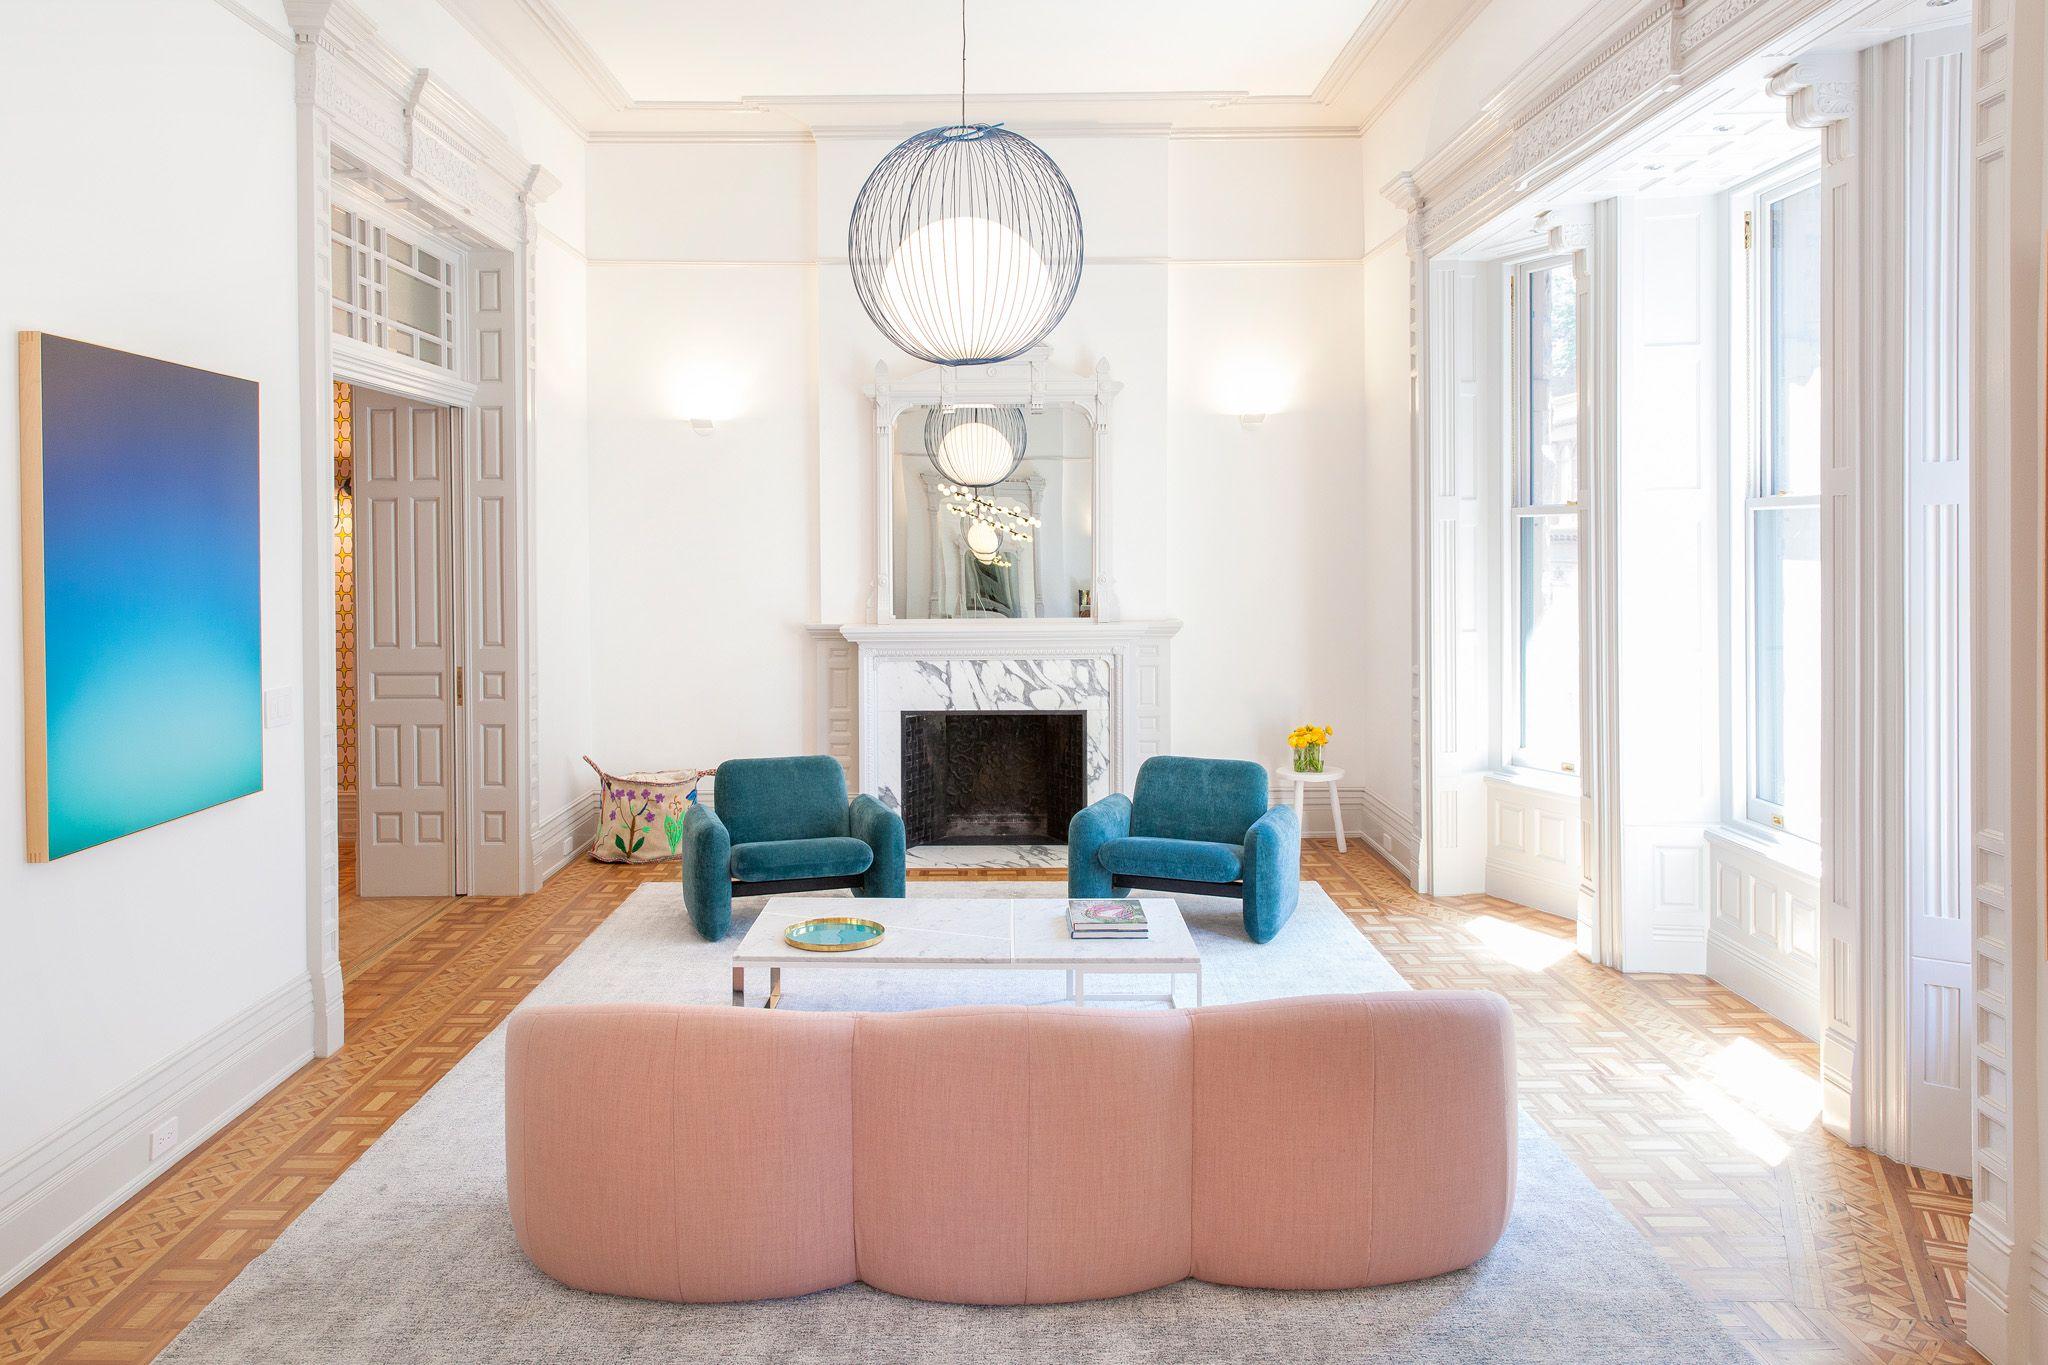 New York, NY Set in the landmarked 19th century Osborne apartment ...